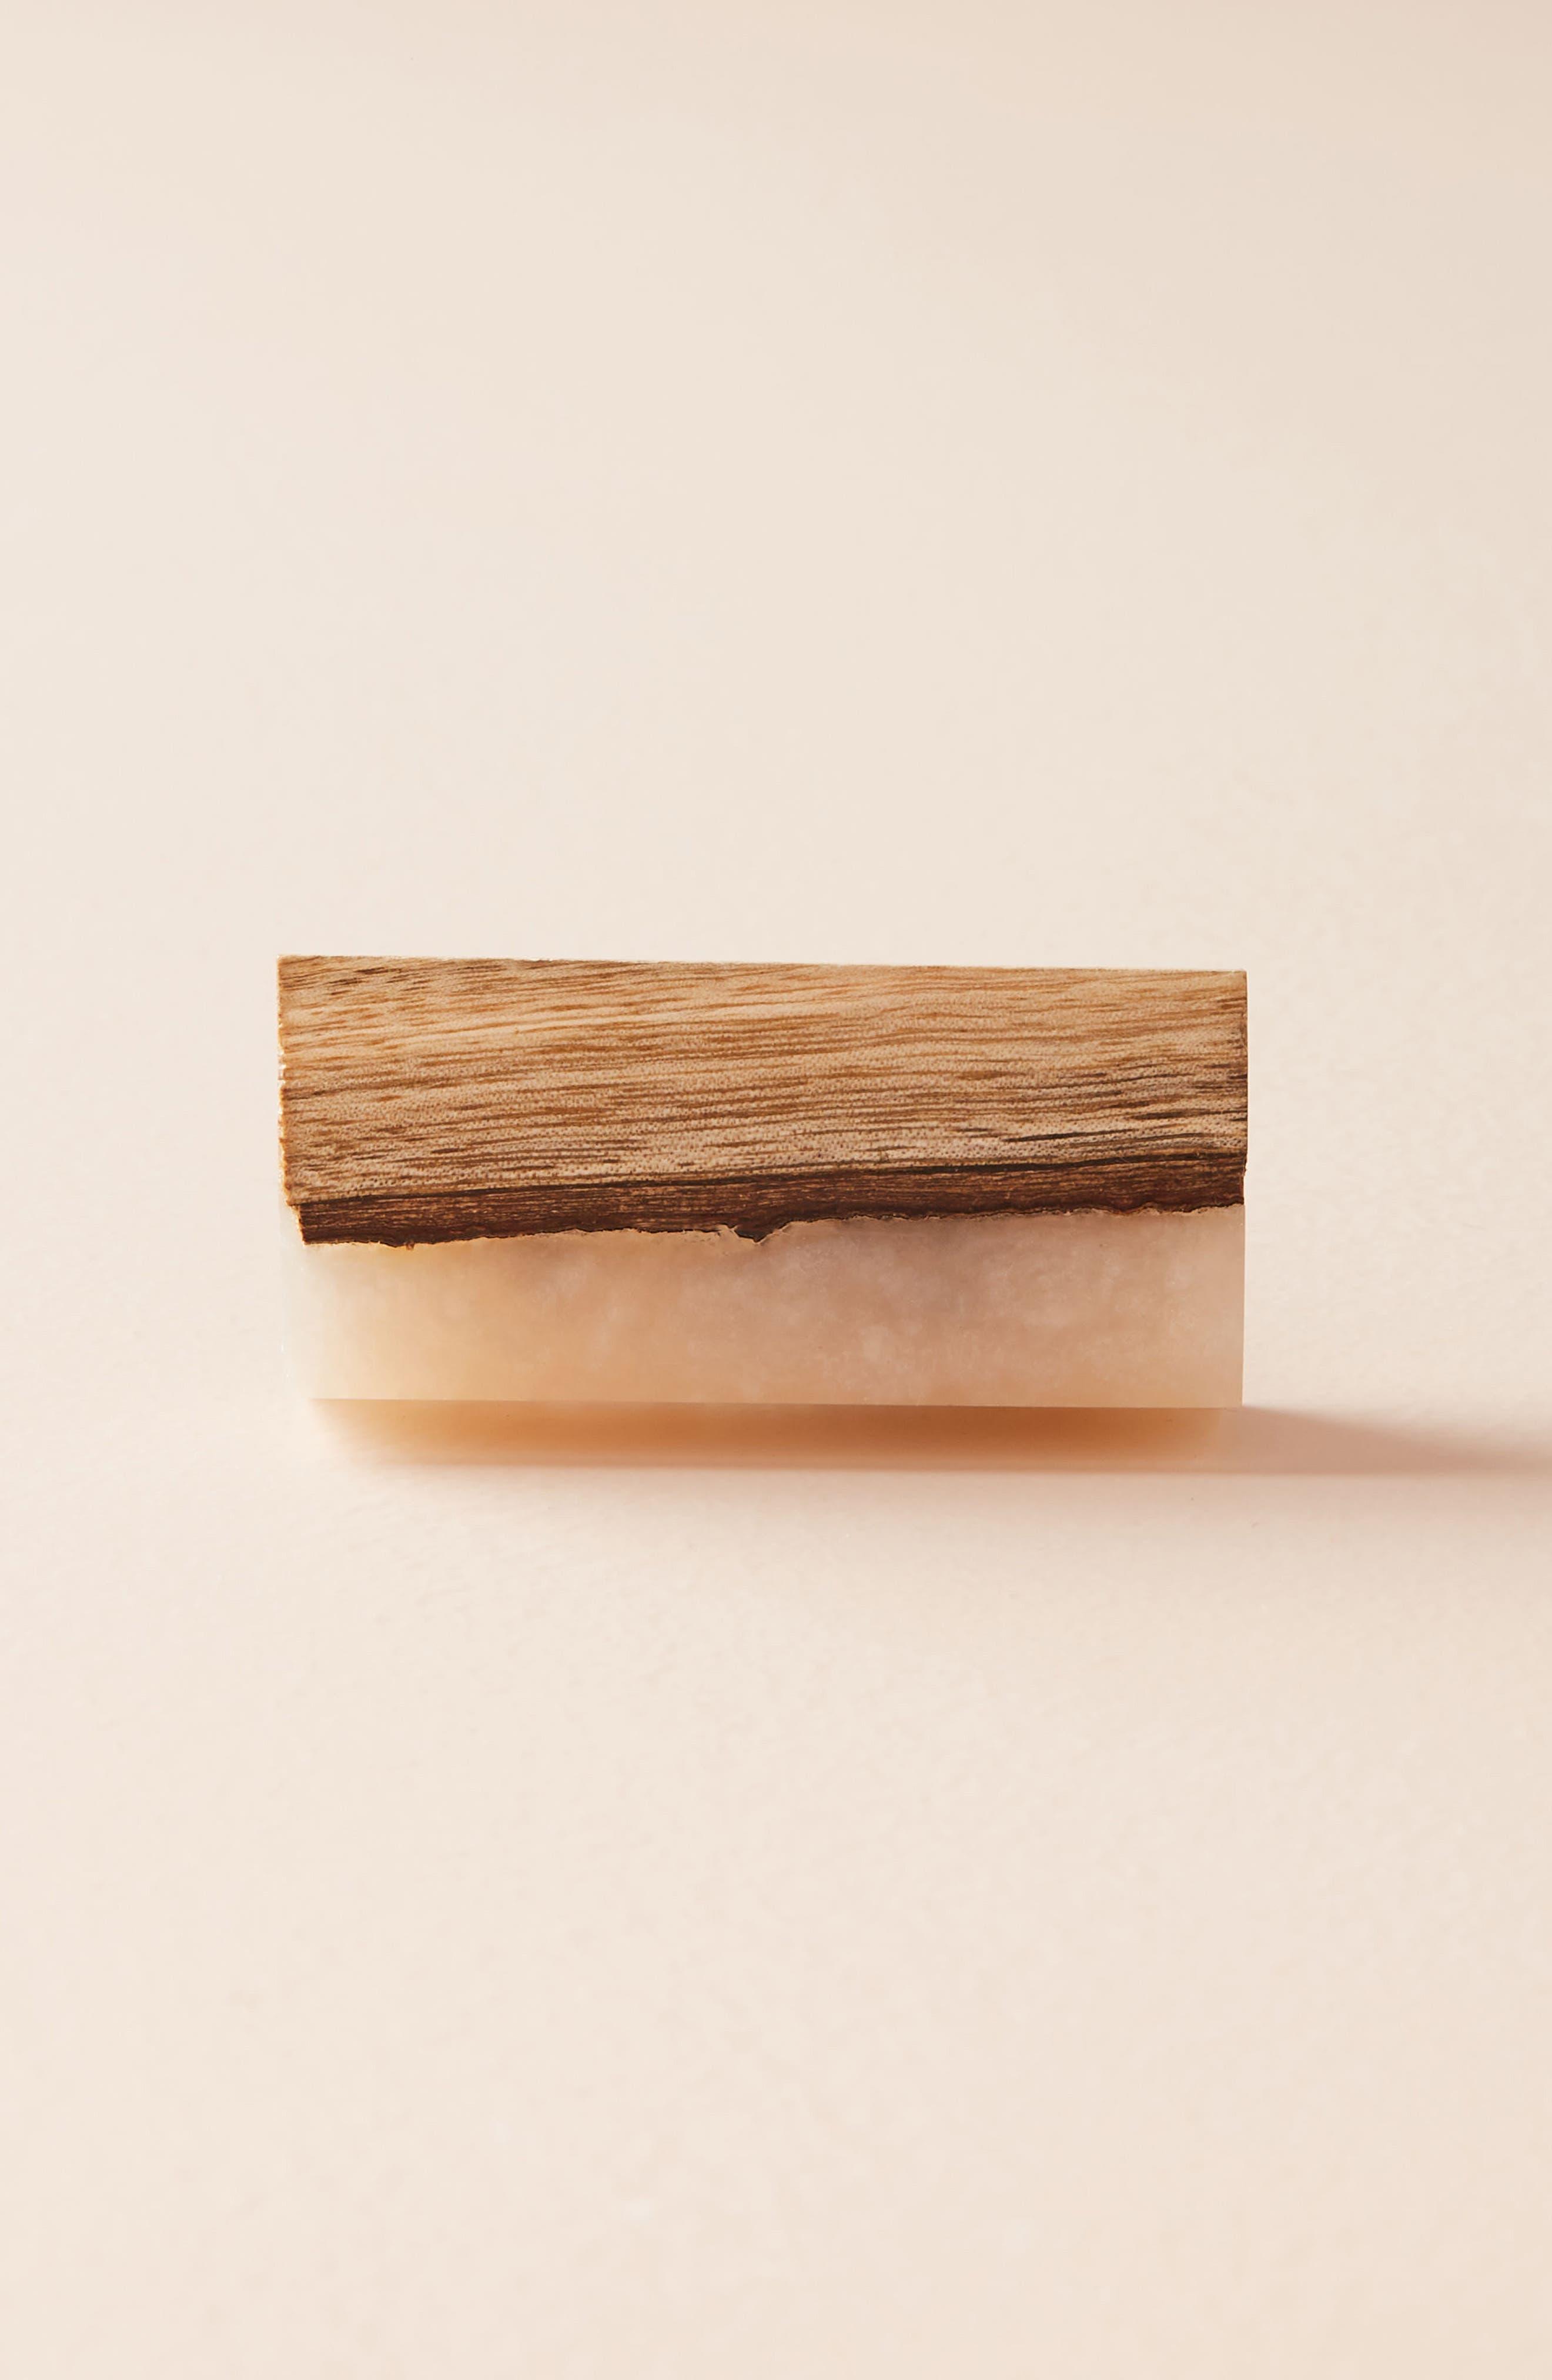 Anthropologie Encapsulated Wood Knob